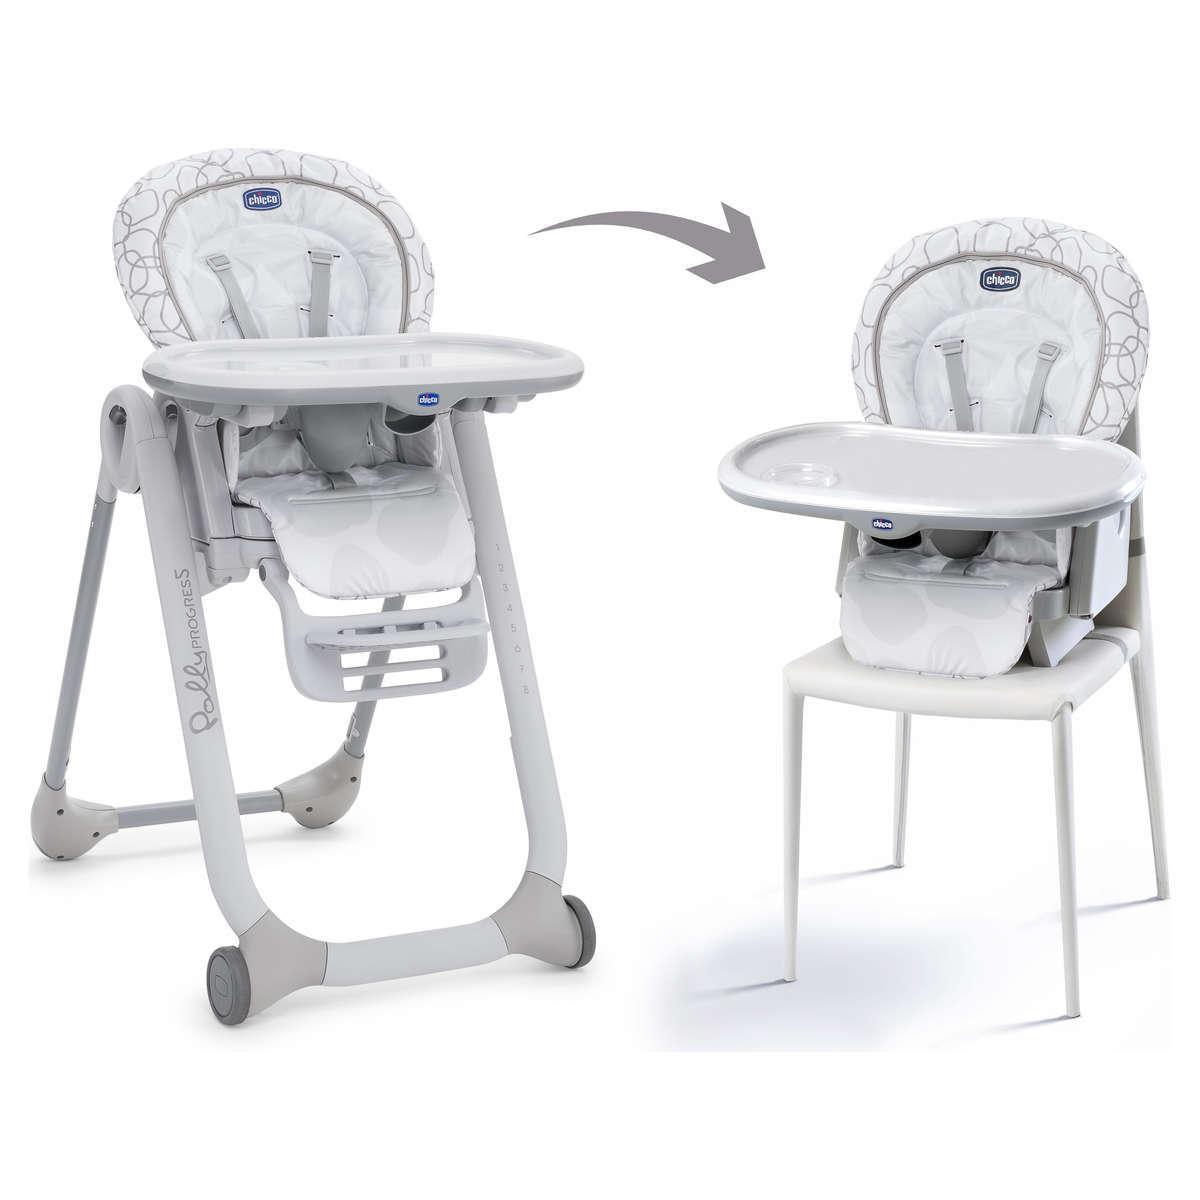 Top chaise haute polly progress grey pas cher with chaise for Chaise haute polly magic pas cher